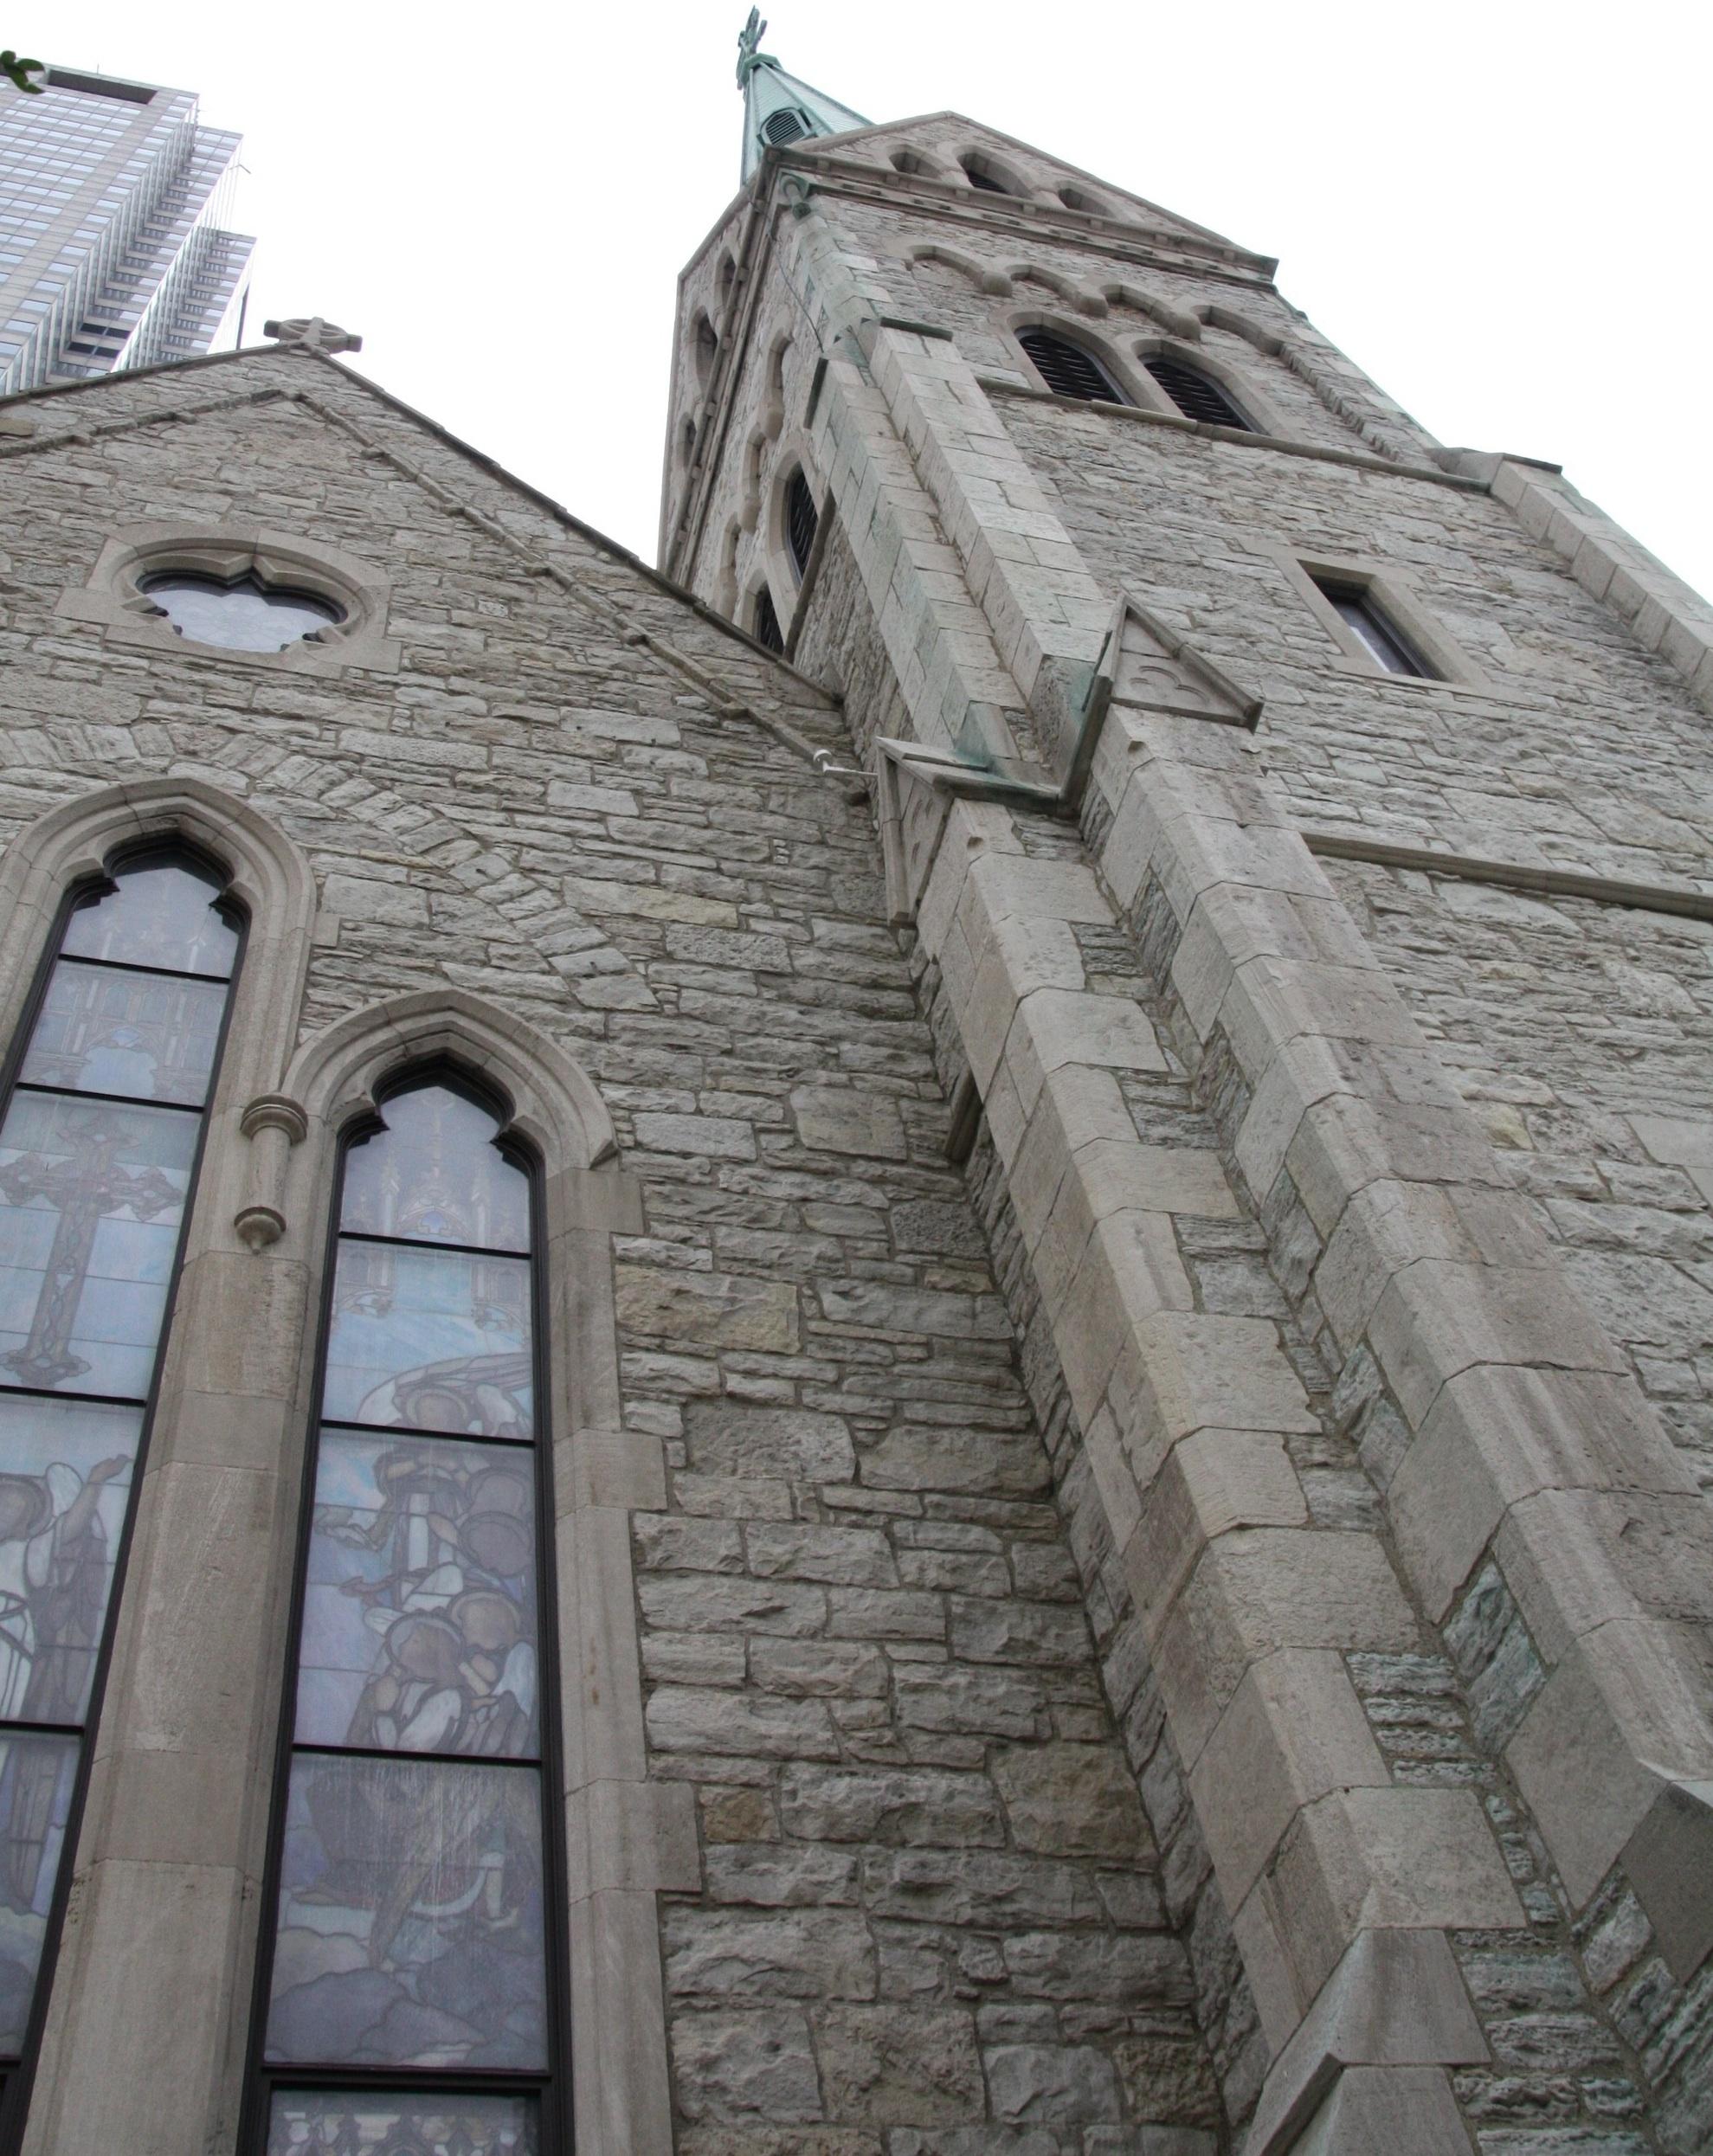 Building Language: Gothic Revival